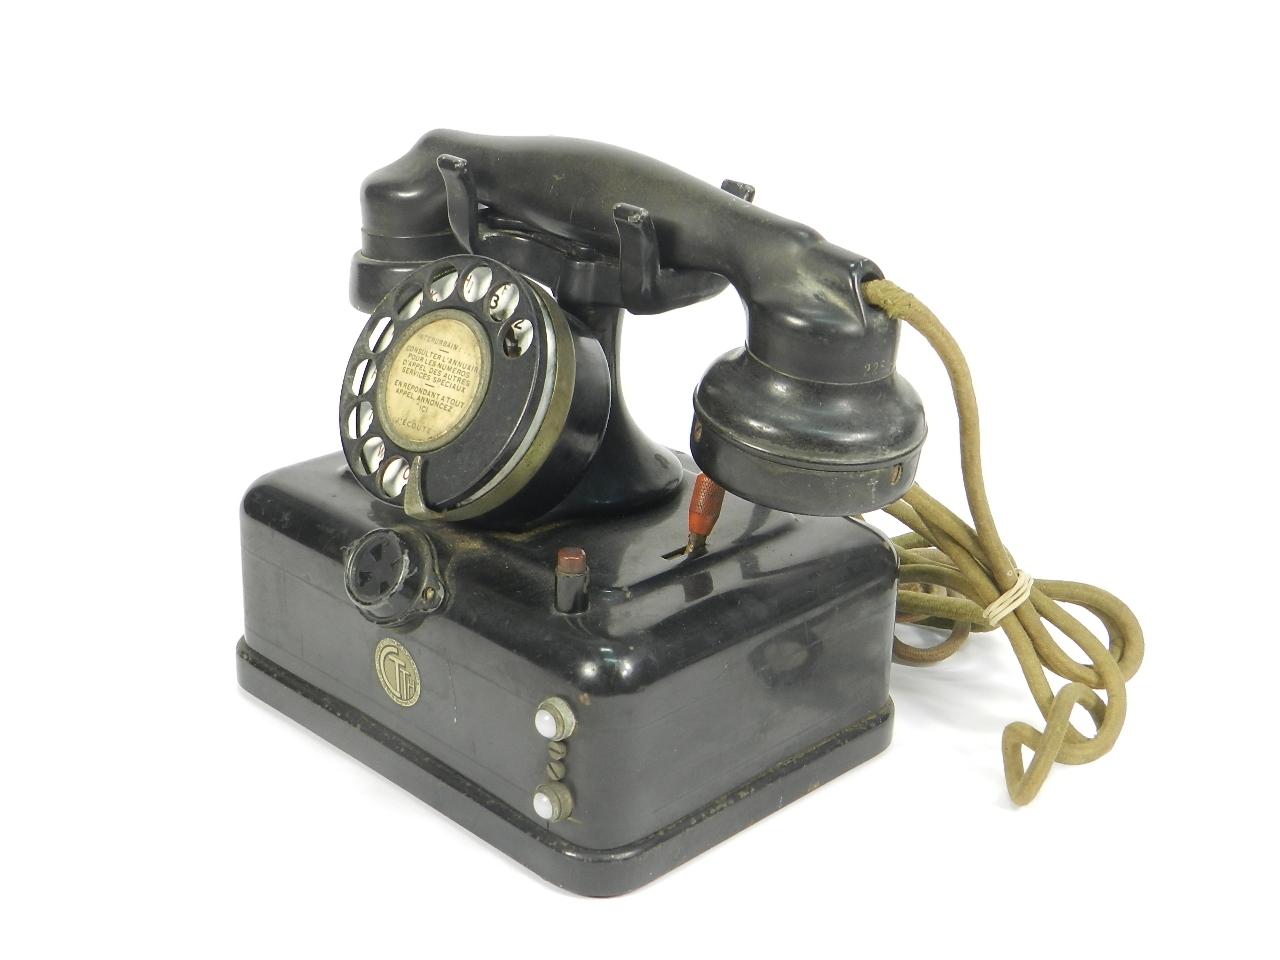 Imagen TELEFONO THOMSON HOUSTON AÑO 1930 41510